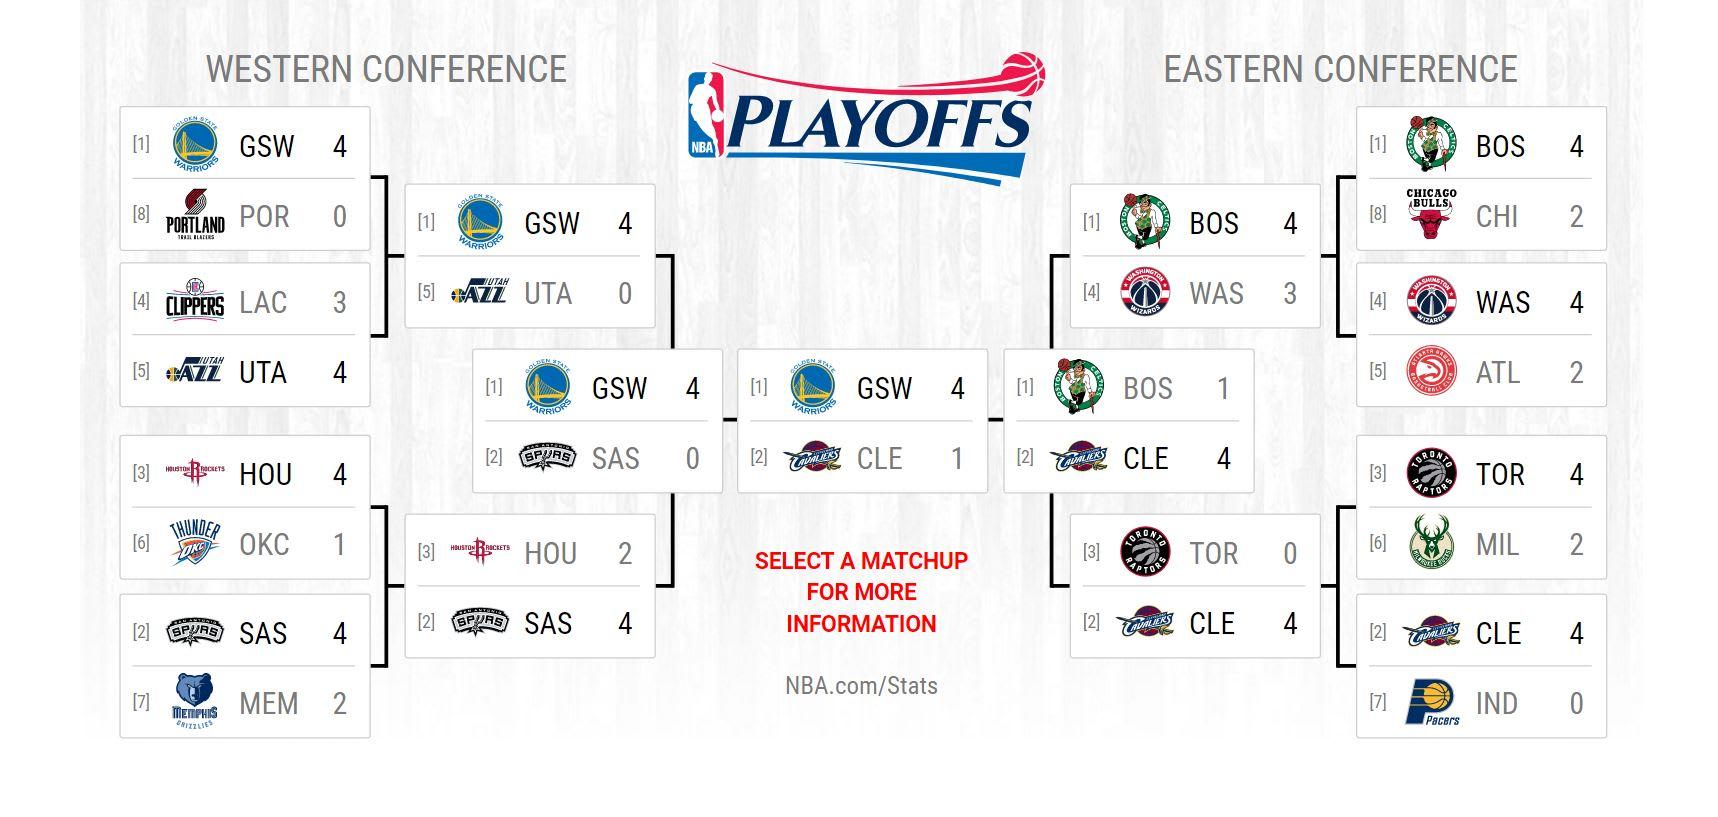 2017 NBA Finals: Final scores, results, bracket for the NBA Playoffs